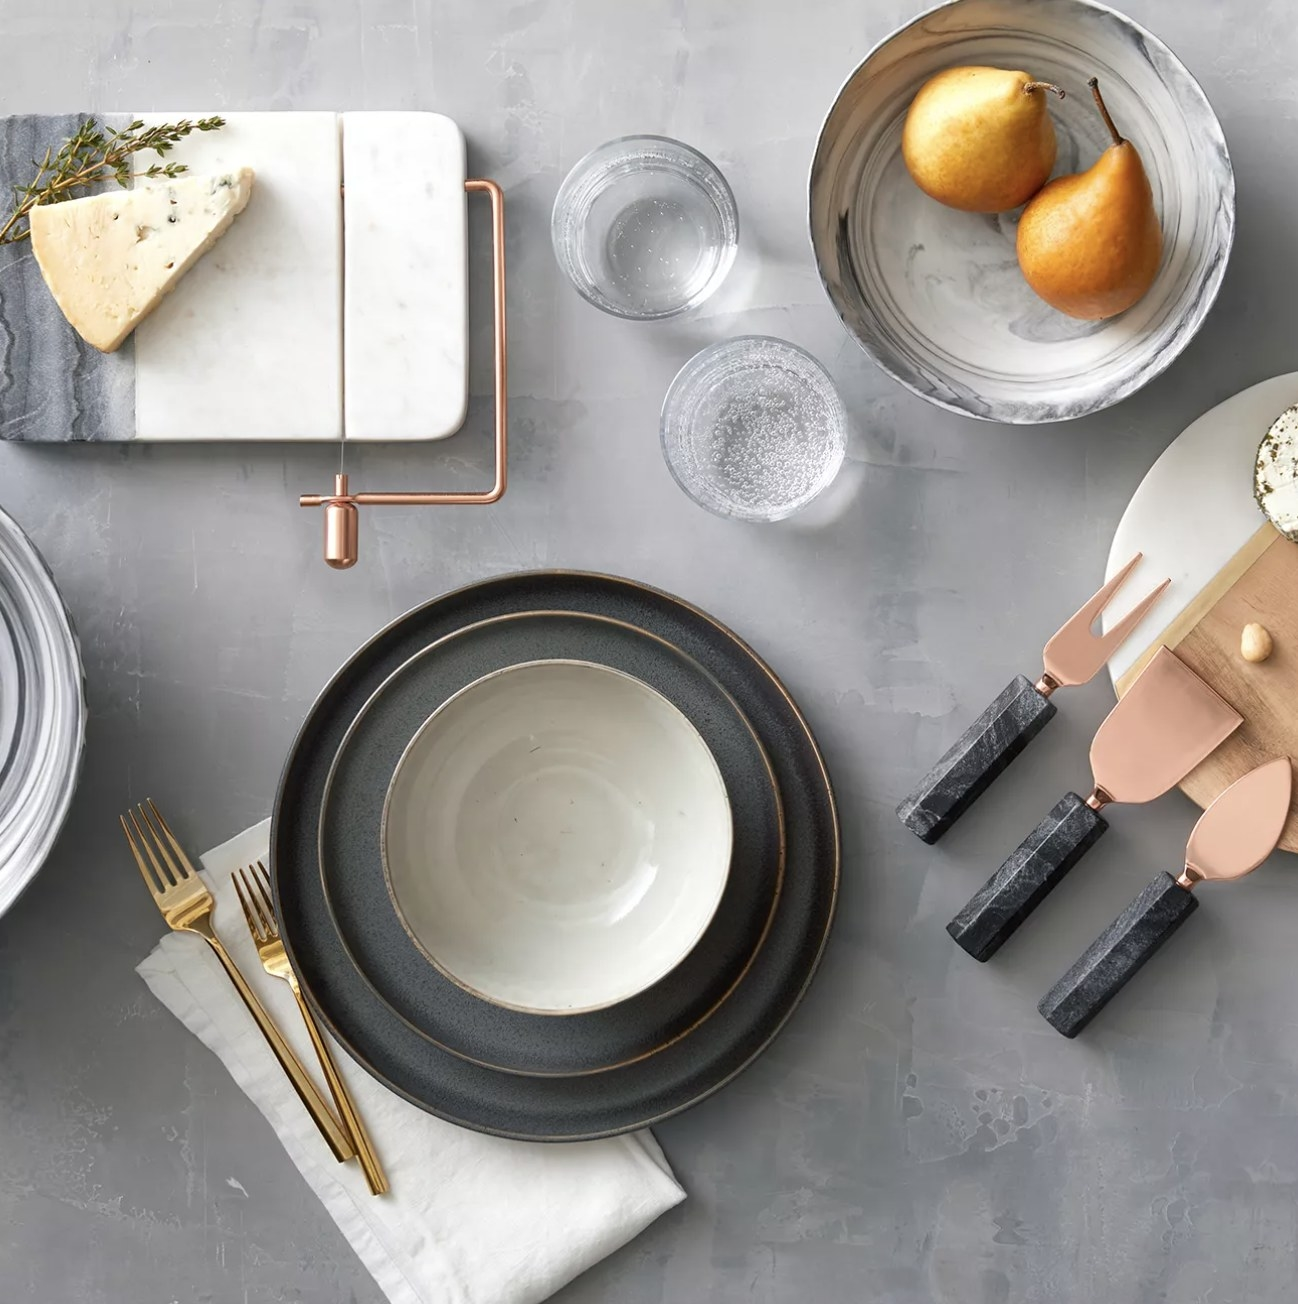 The dinnerware set